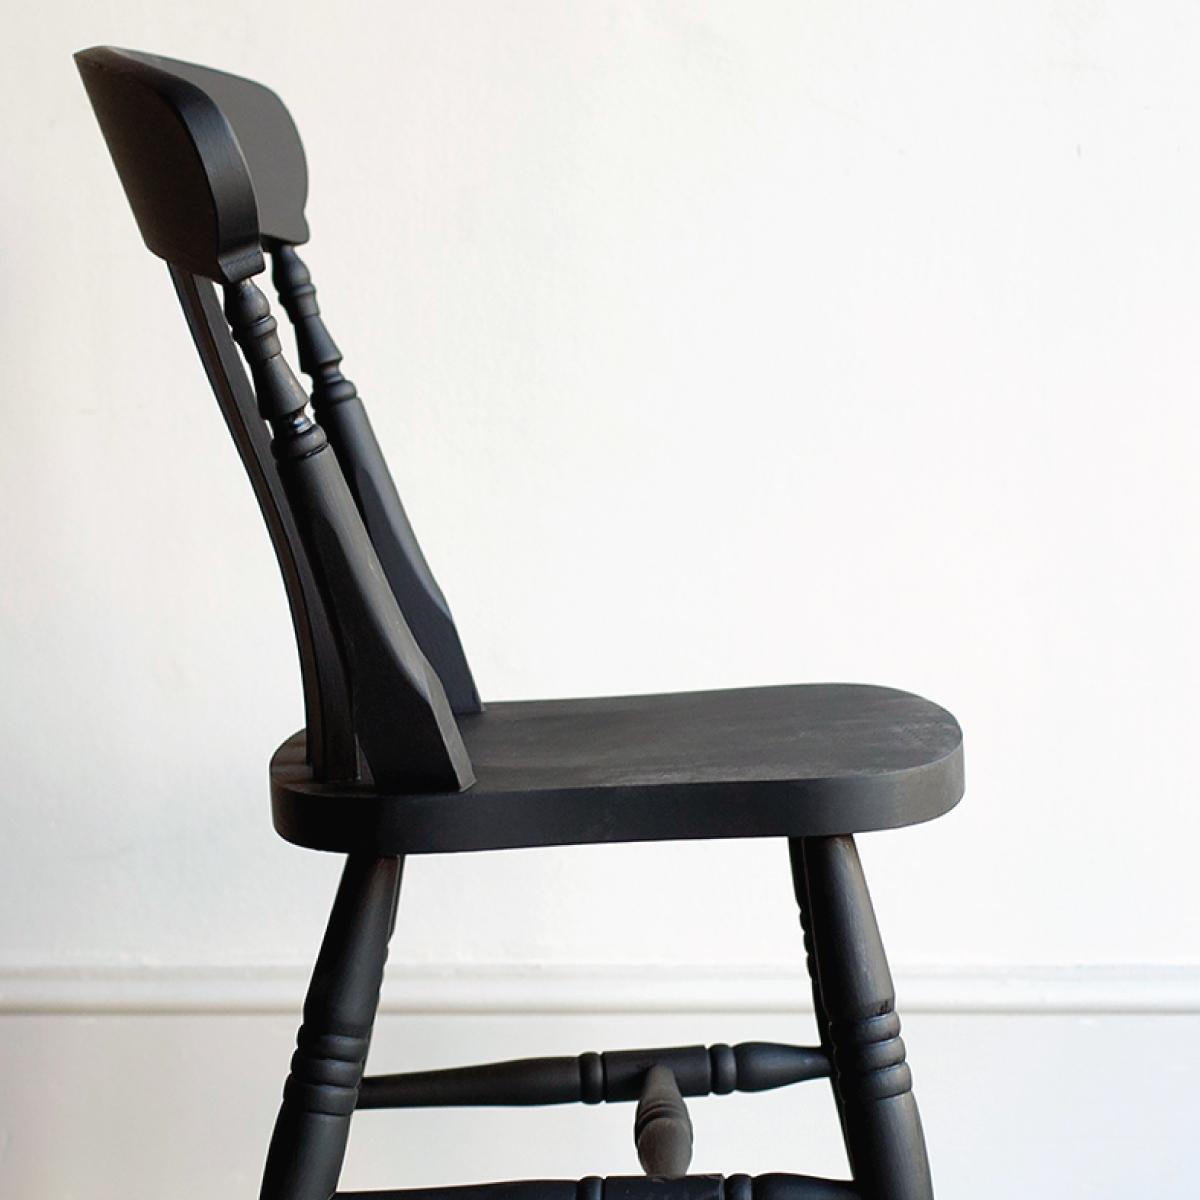 HOWE-Windsor-Chair-3